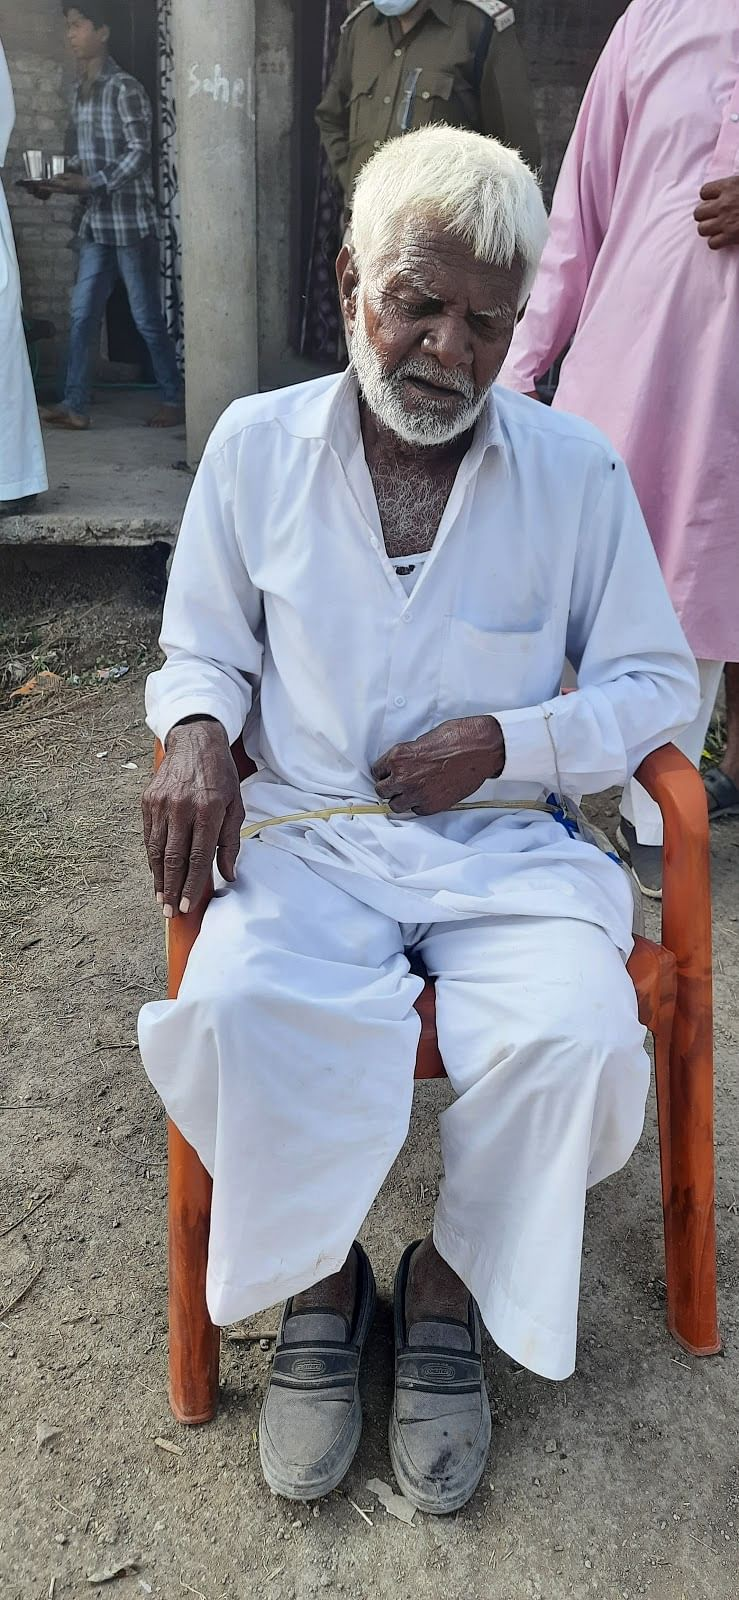 75 साल के कादर पटेल